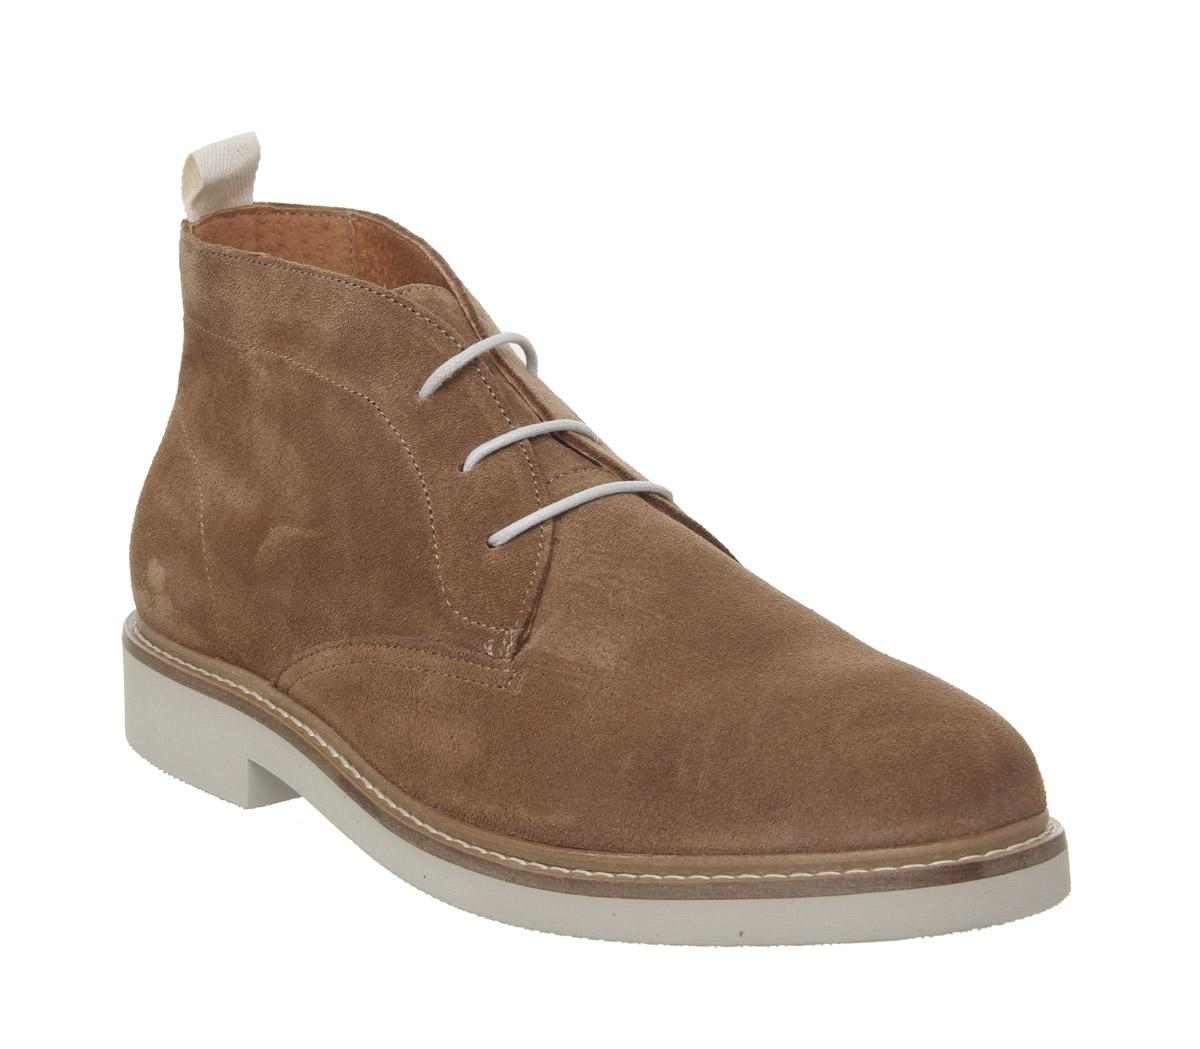 Seaford Chukka Boots